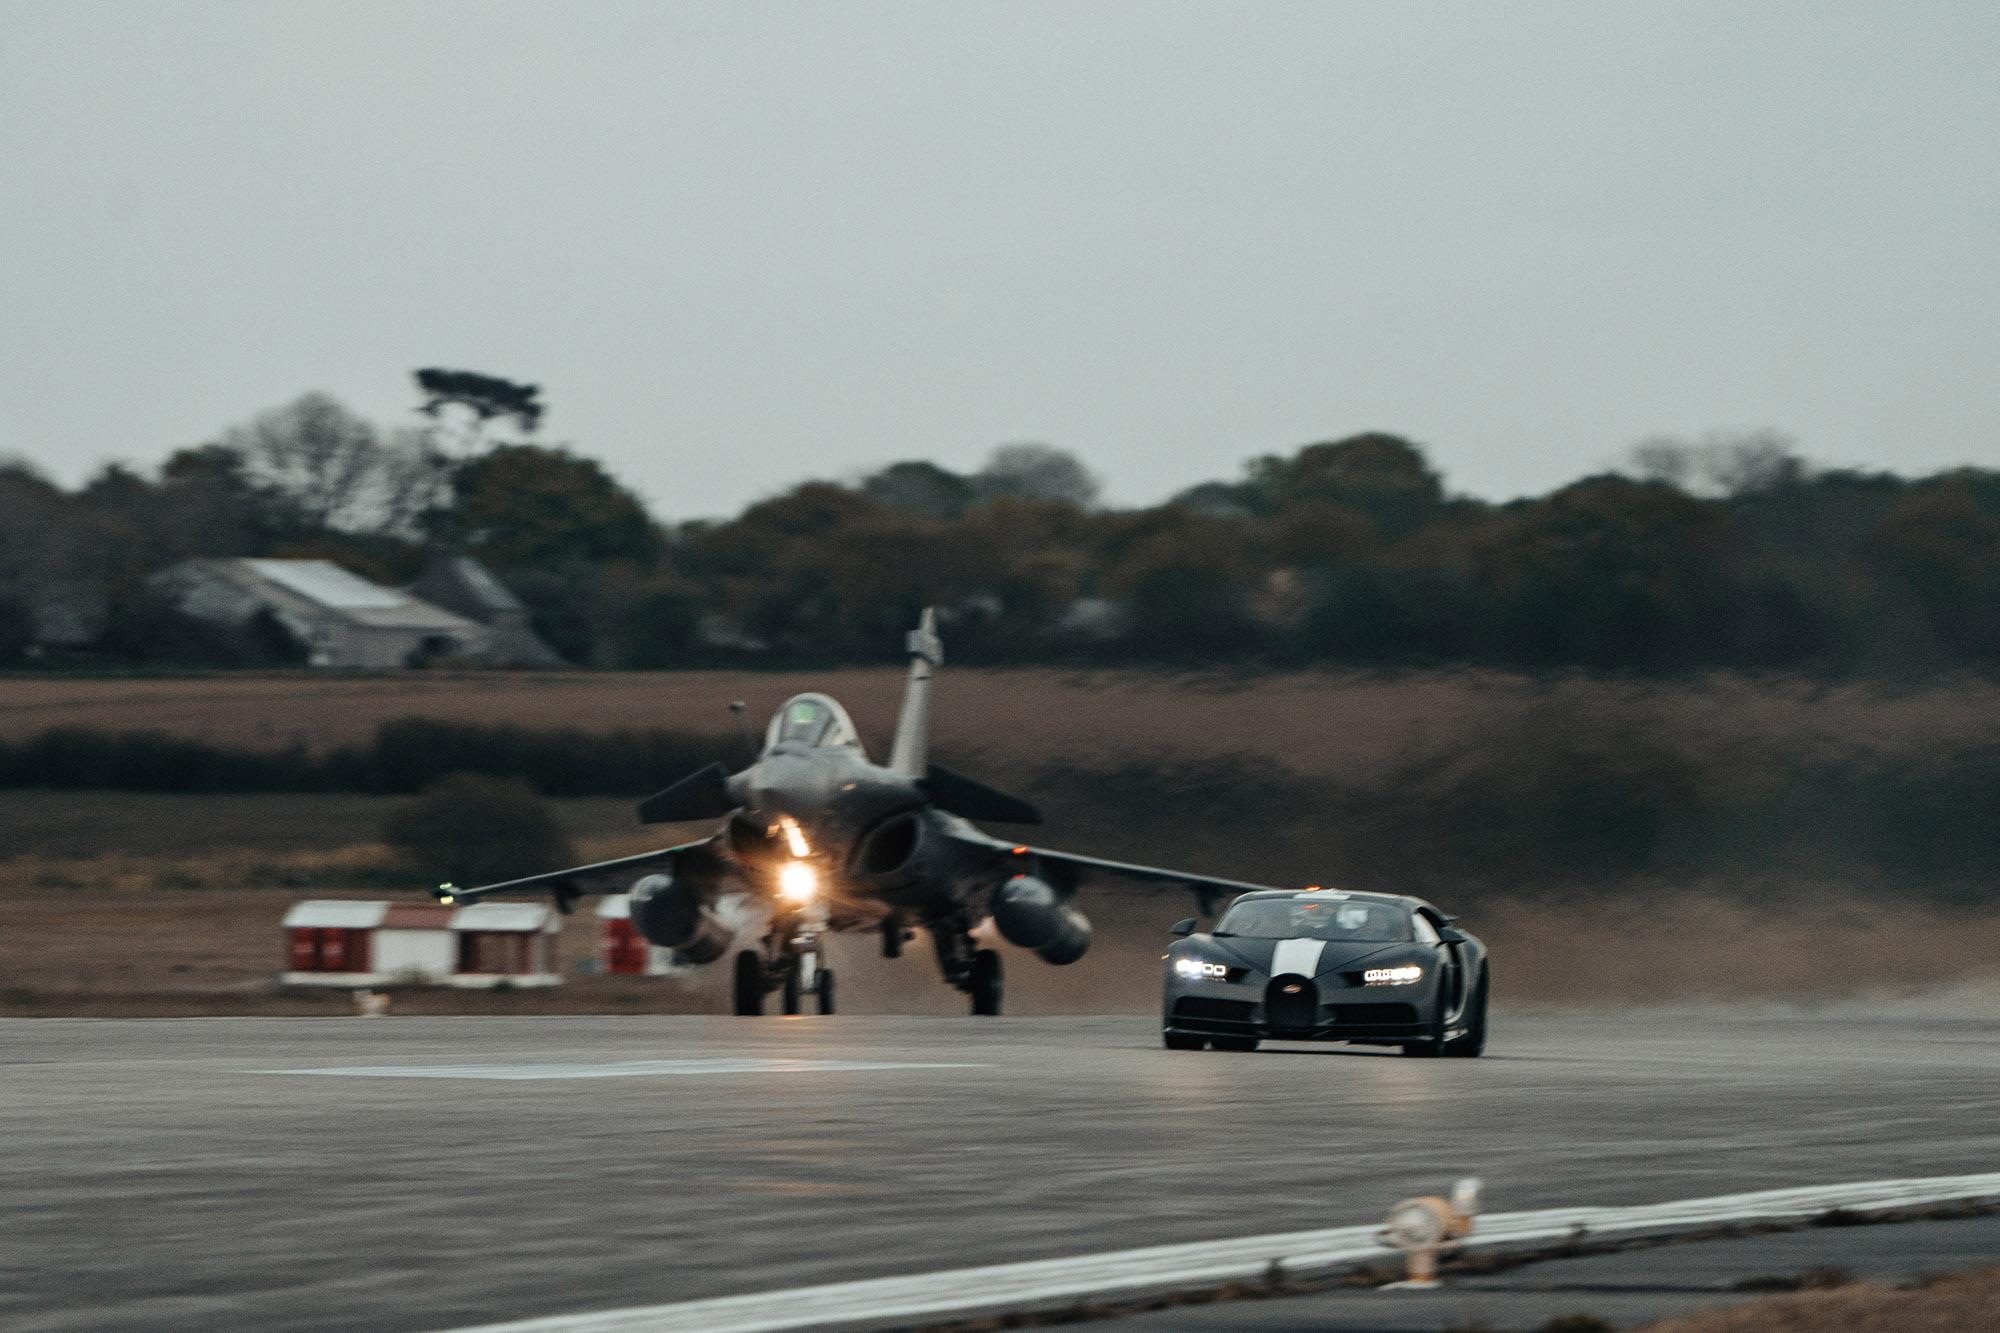 Bugatt Chiron Les Legends du Ciel contra Dassault Rafale Marine rolagem